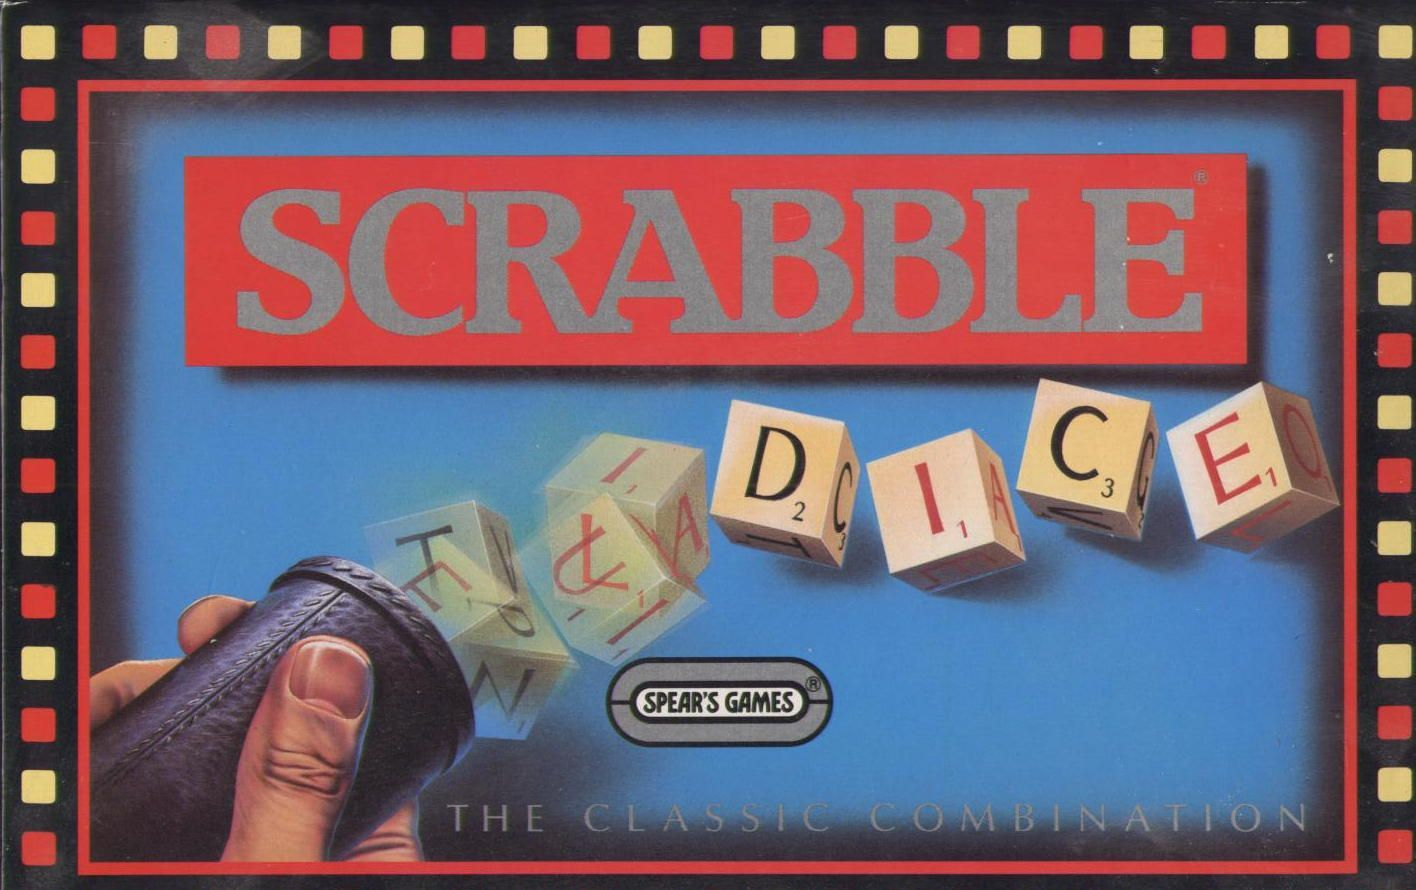 Scrabble Dice